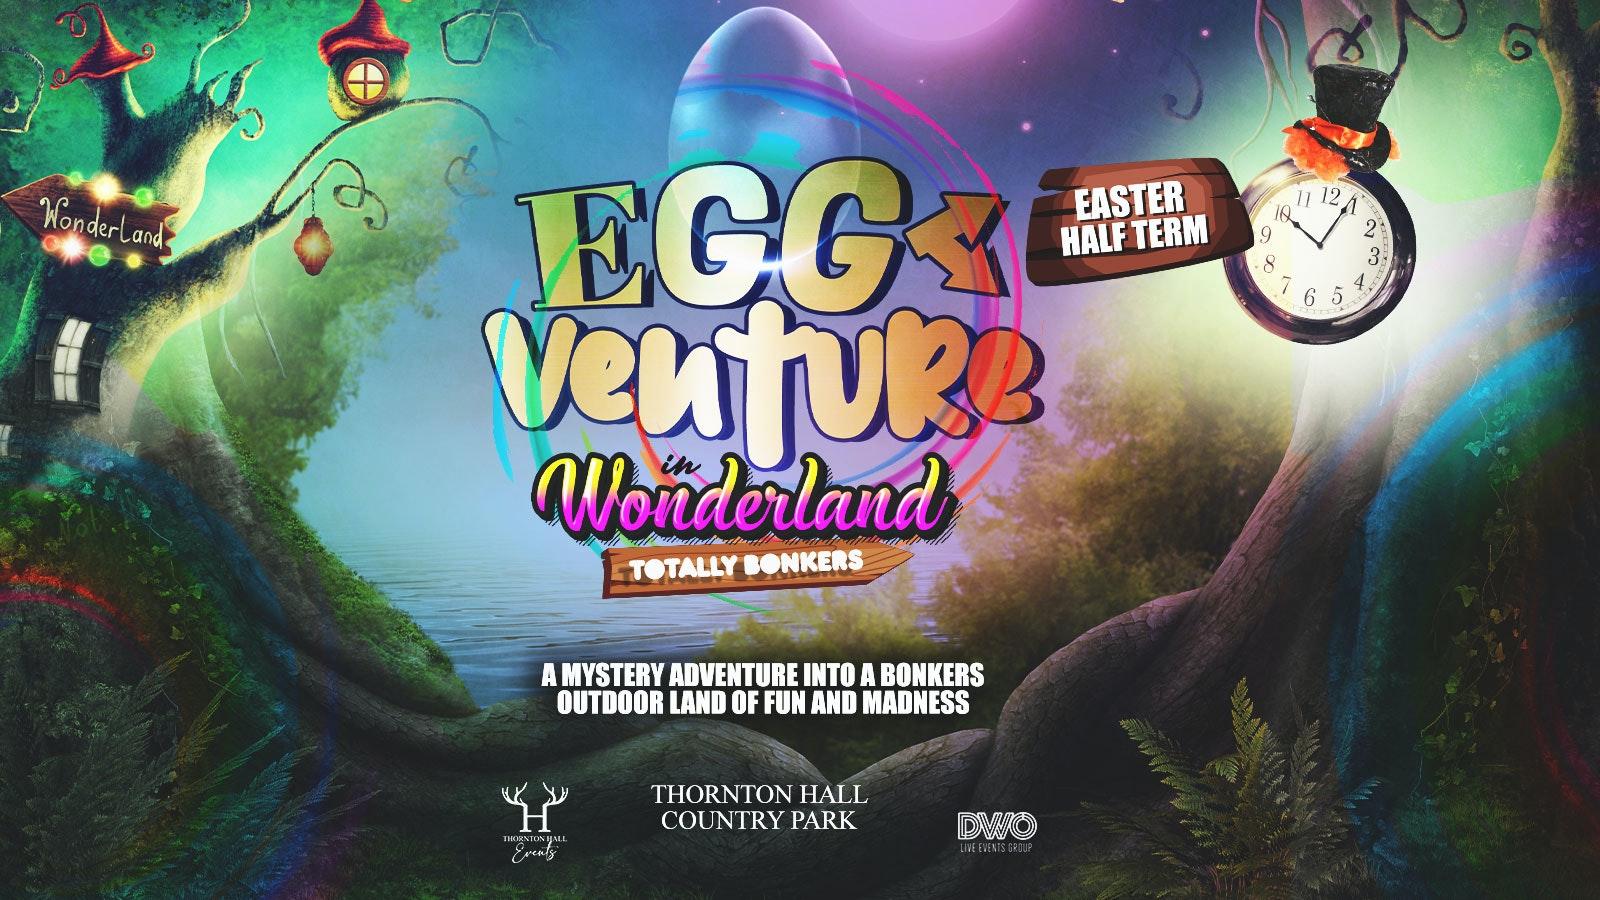 EggVenture in Wonderland – Wednesday 7th April – 2.30pm